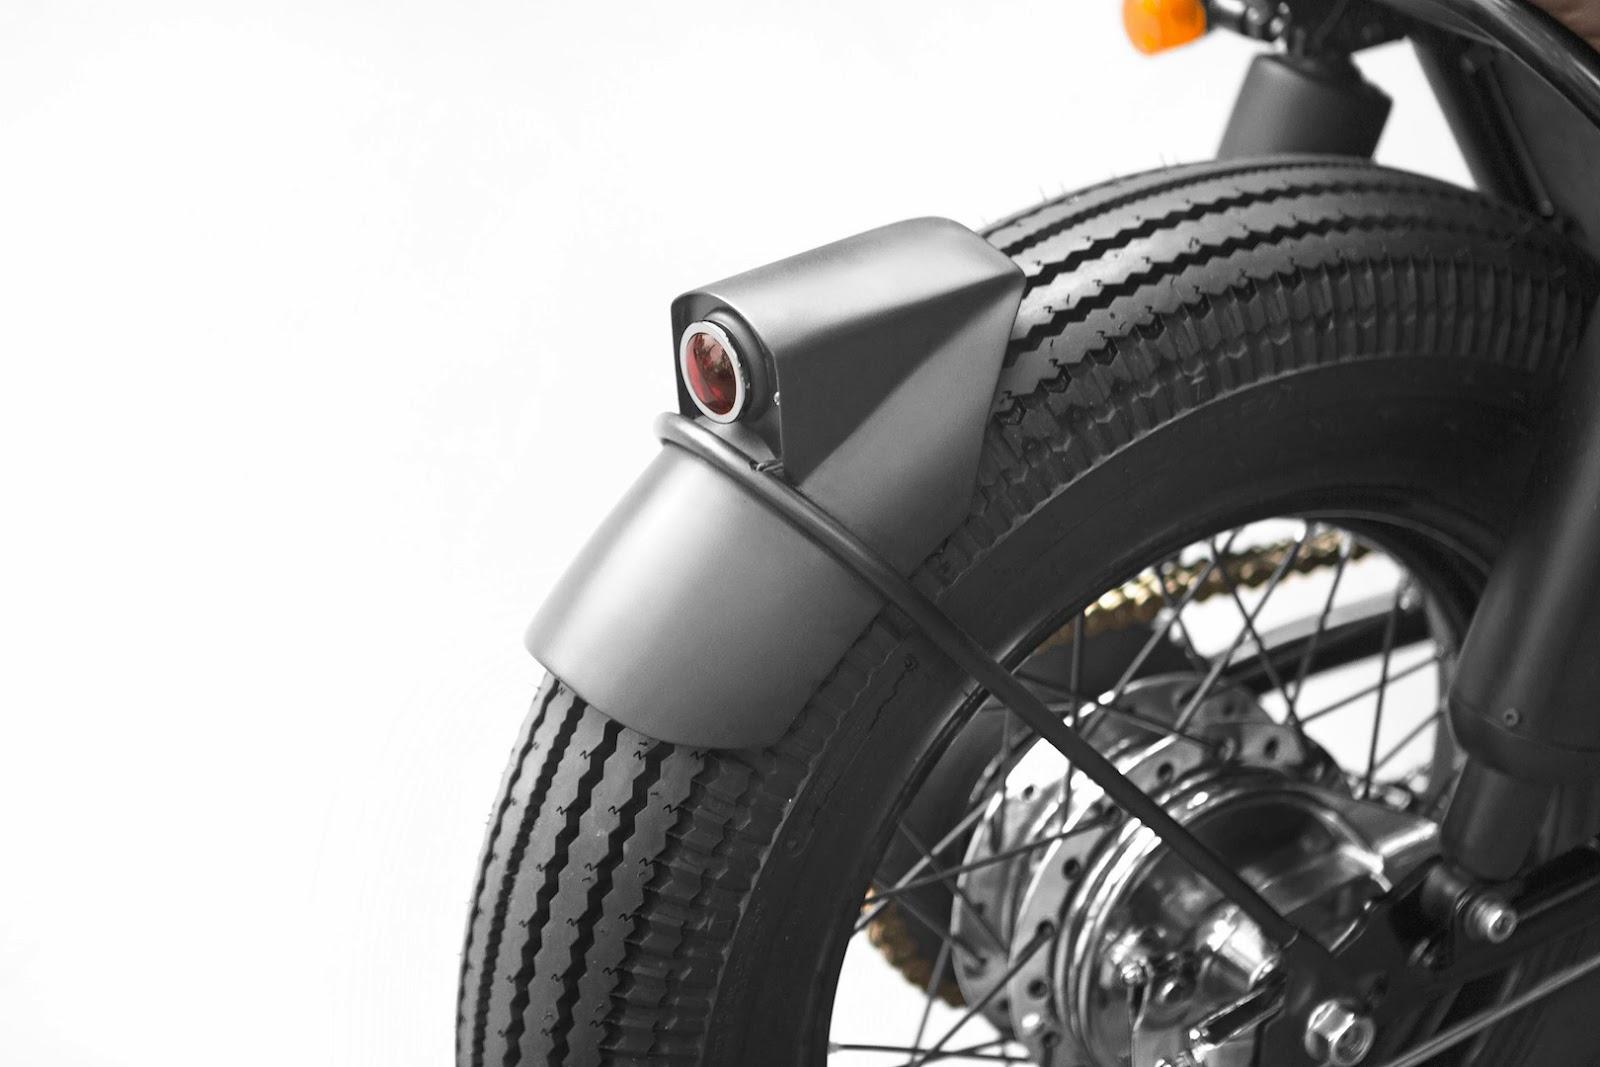 Moon_Yamaha_XS650_Thrive_Moto-Mucci (6)